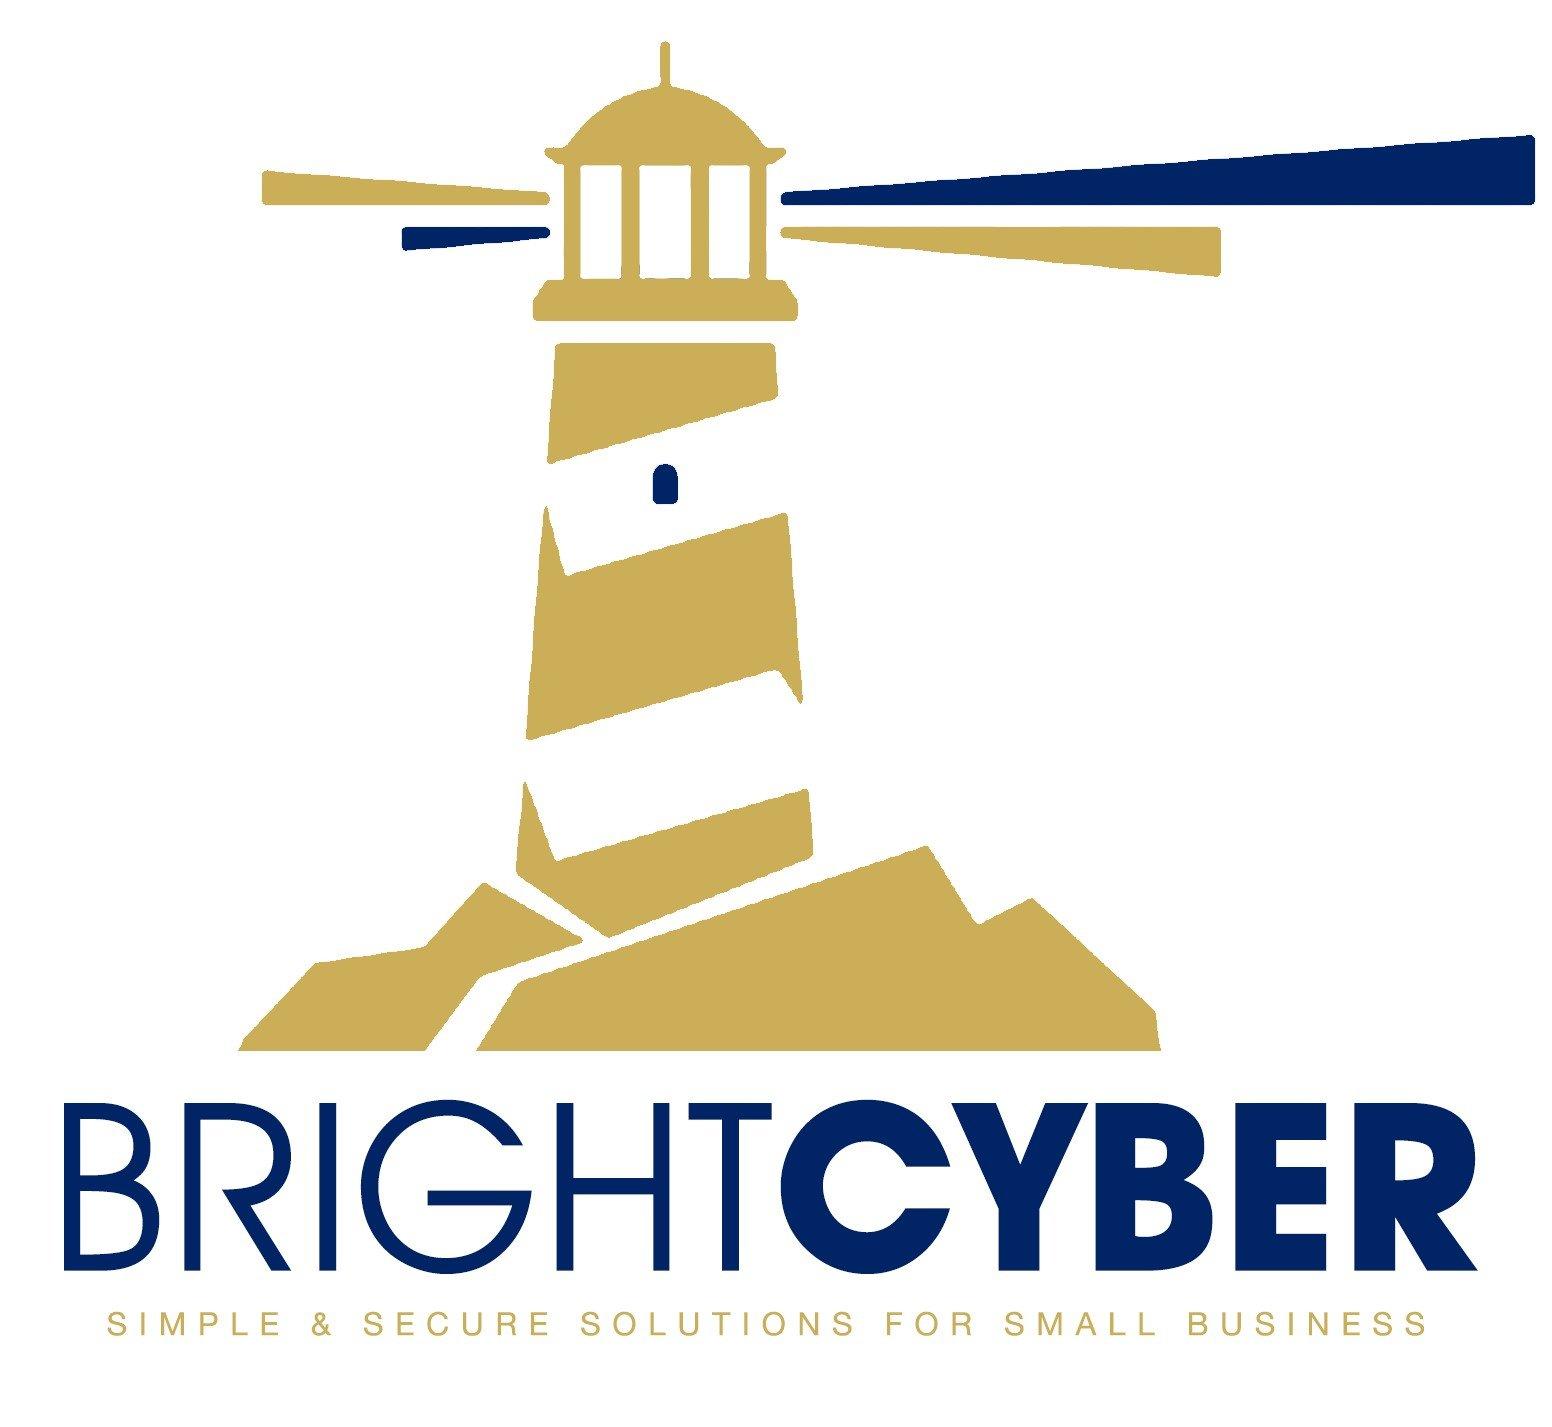 BrightCyber